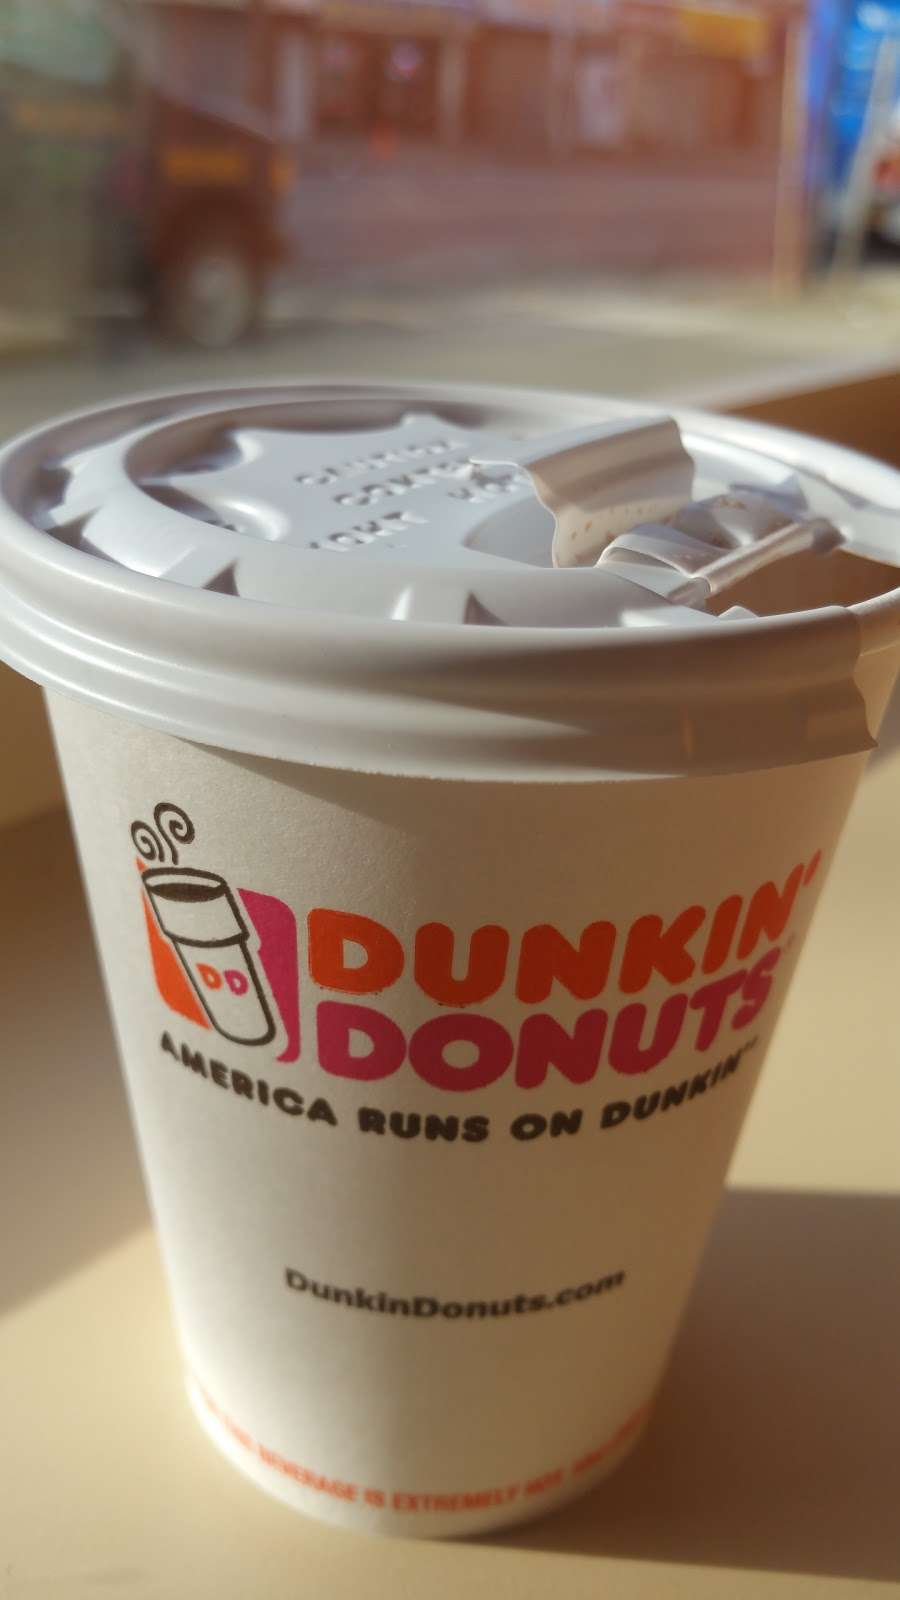 Dunkin Donuts - cafe  | Photo 4 of 10 | Address: 122-17 Liberty Ave, South Richmond Hill, NY 11419, USA | Phone: (718) 848-4874